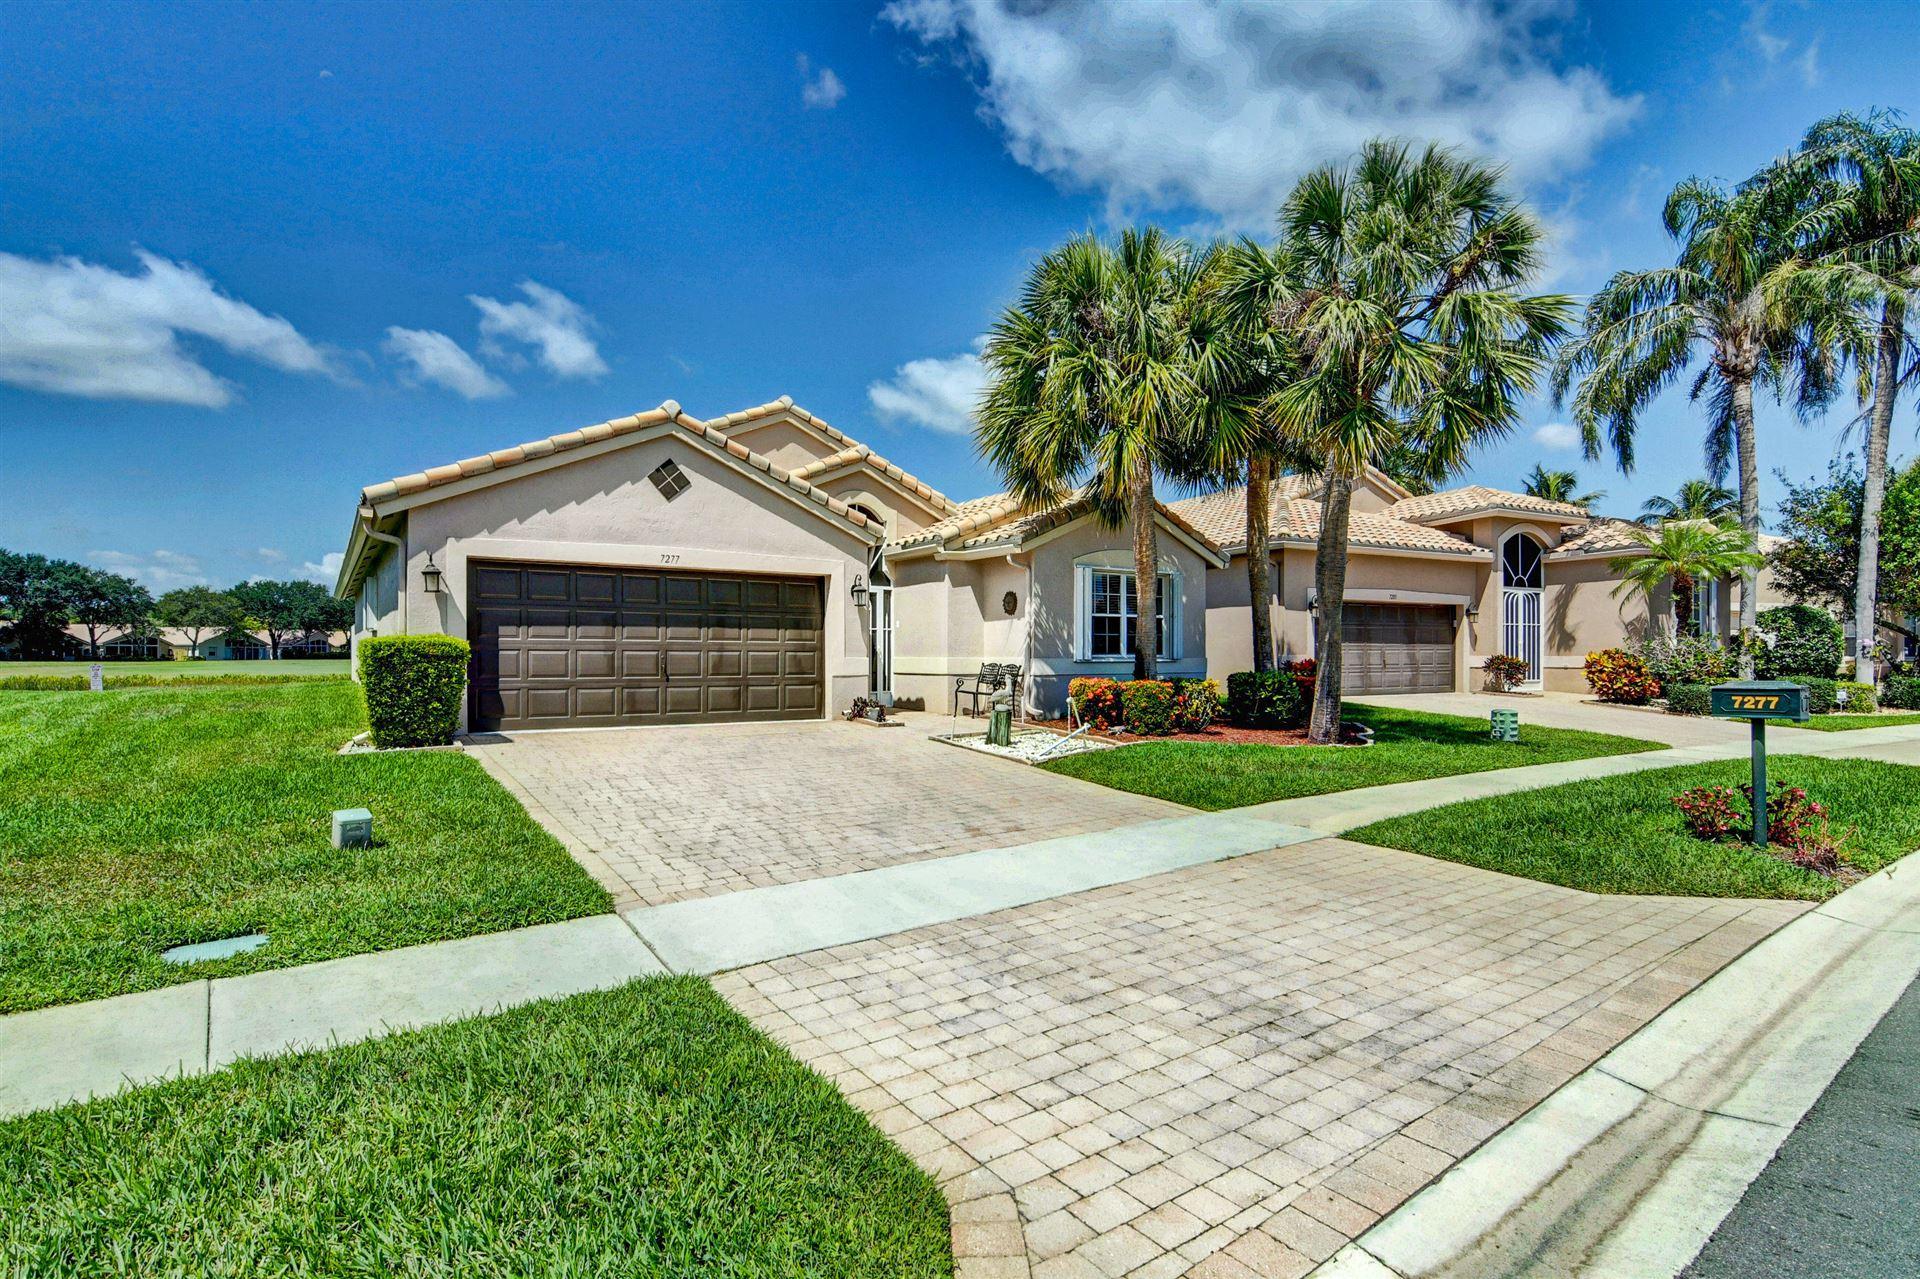 7277 Haviland Circle, Boynton Beach, FL 33437 - #: RX-10713759